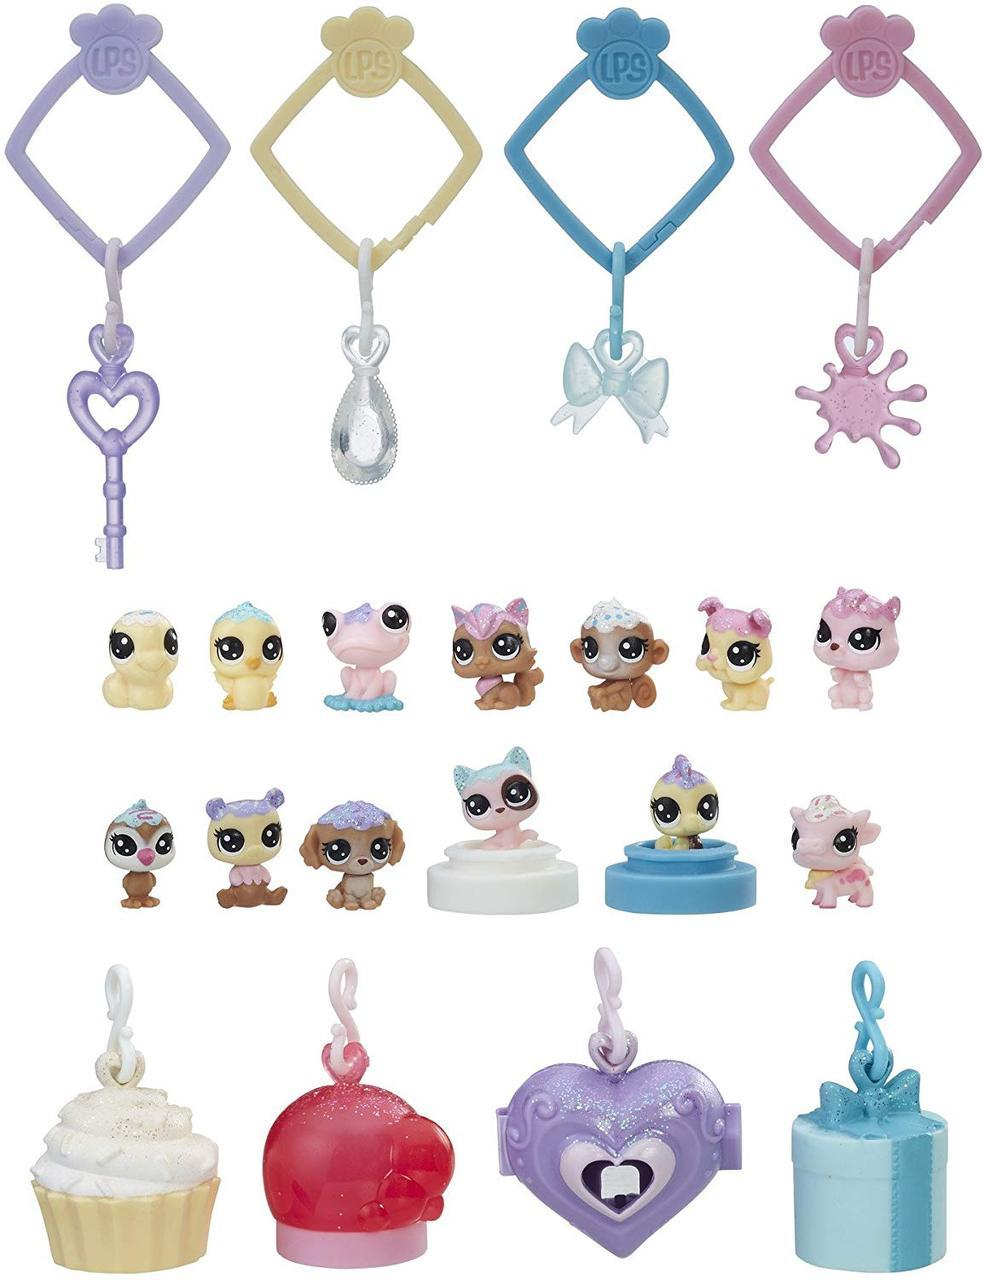 Лител пет шоп Набор Брелков с питомцами  Оригинал Hasbro Littlest Pet Shop Литлес лпс лпш  LPS